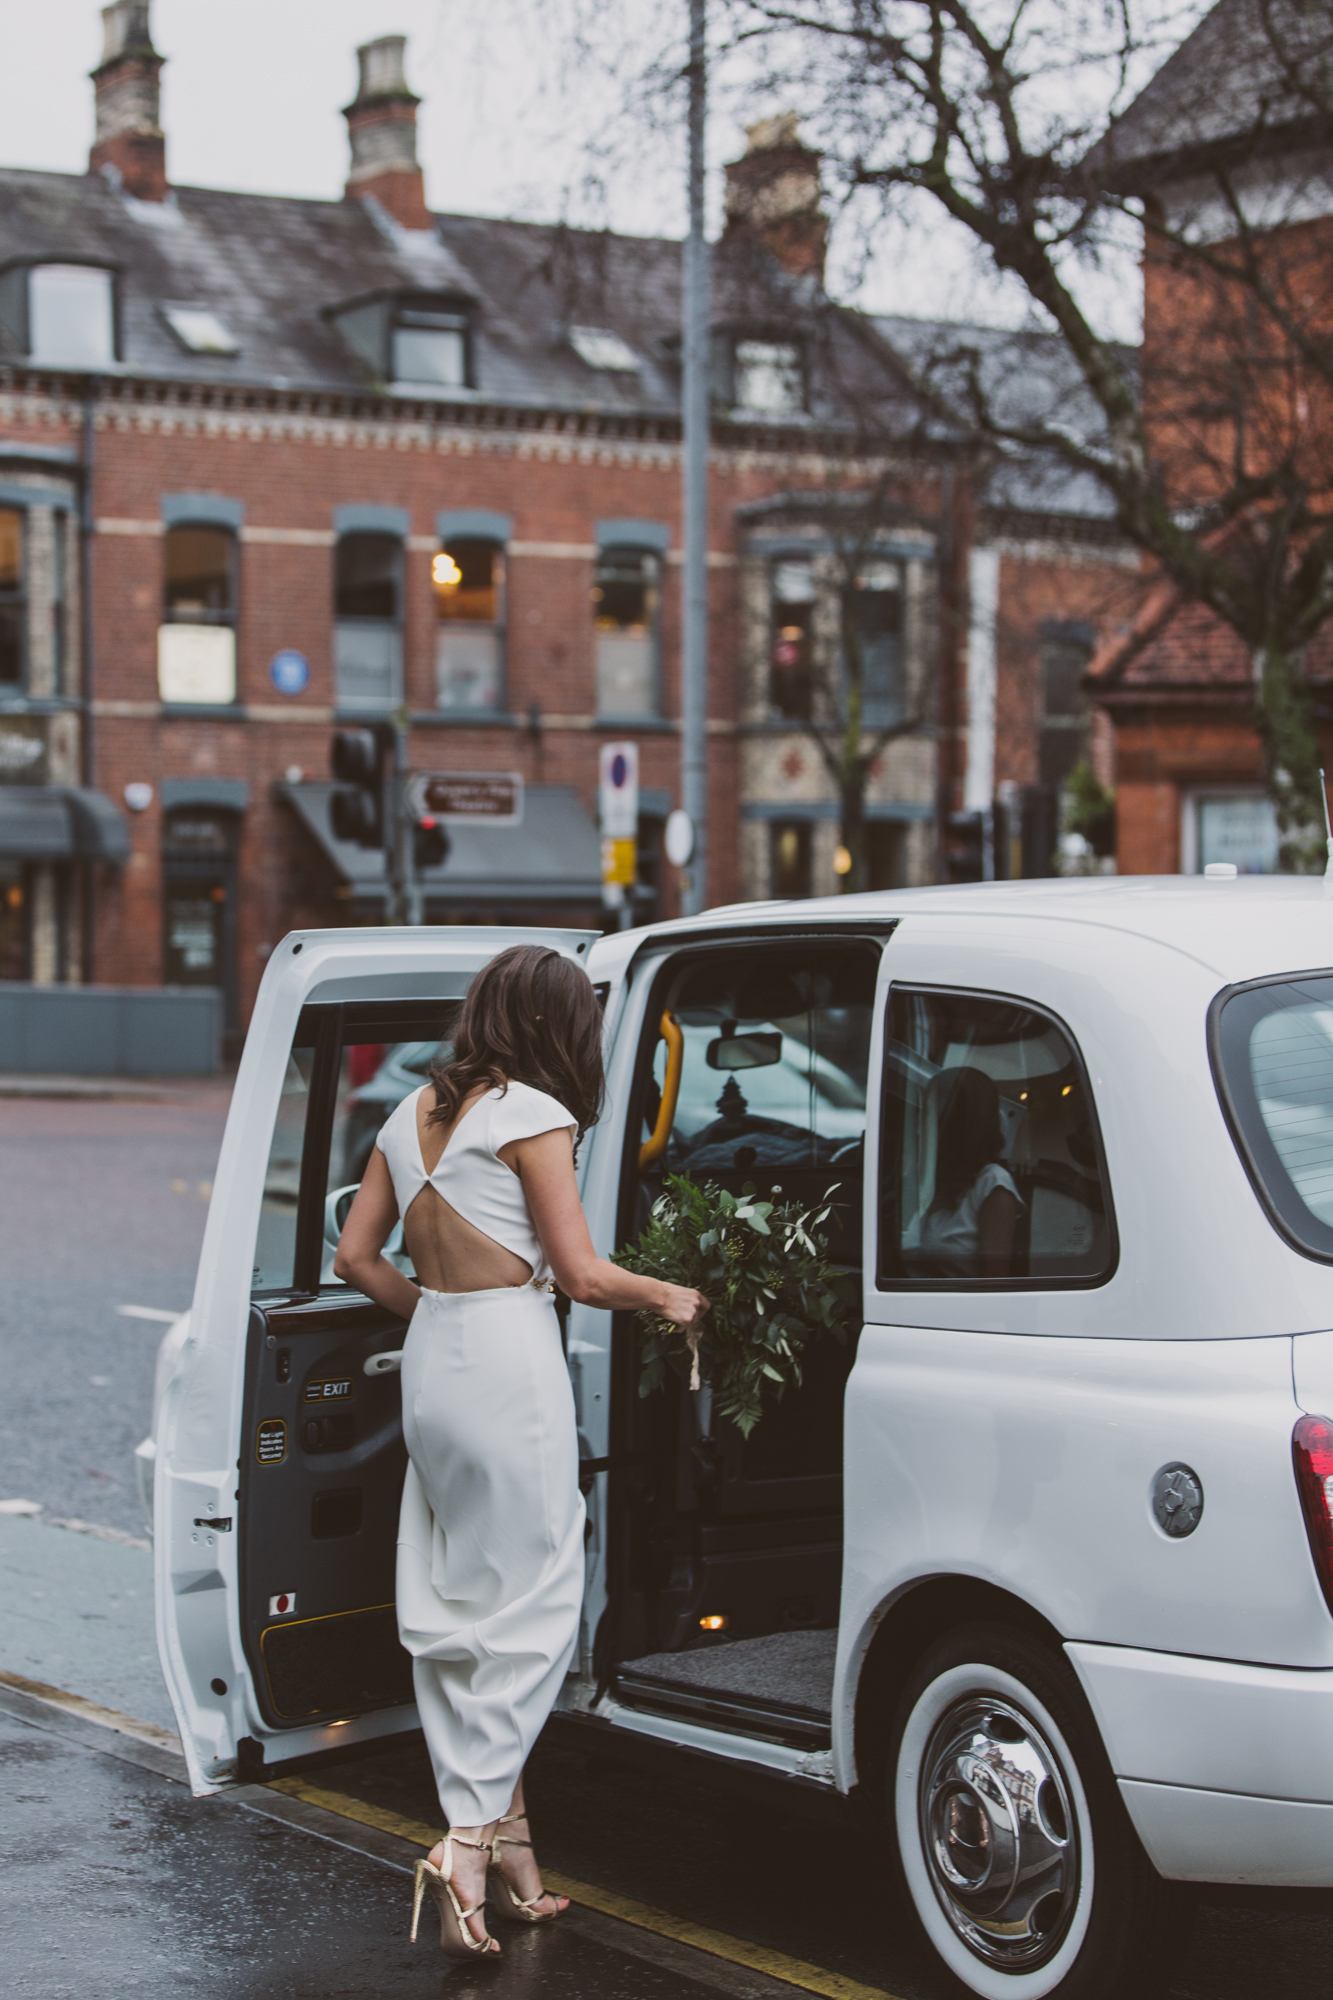 City_Centre_northern_ireland_wedding_inspire_weddings_11.jpg